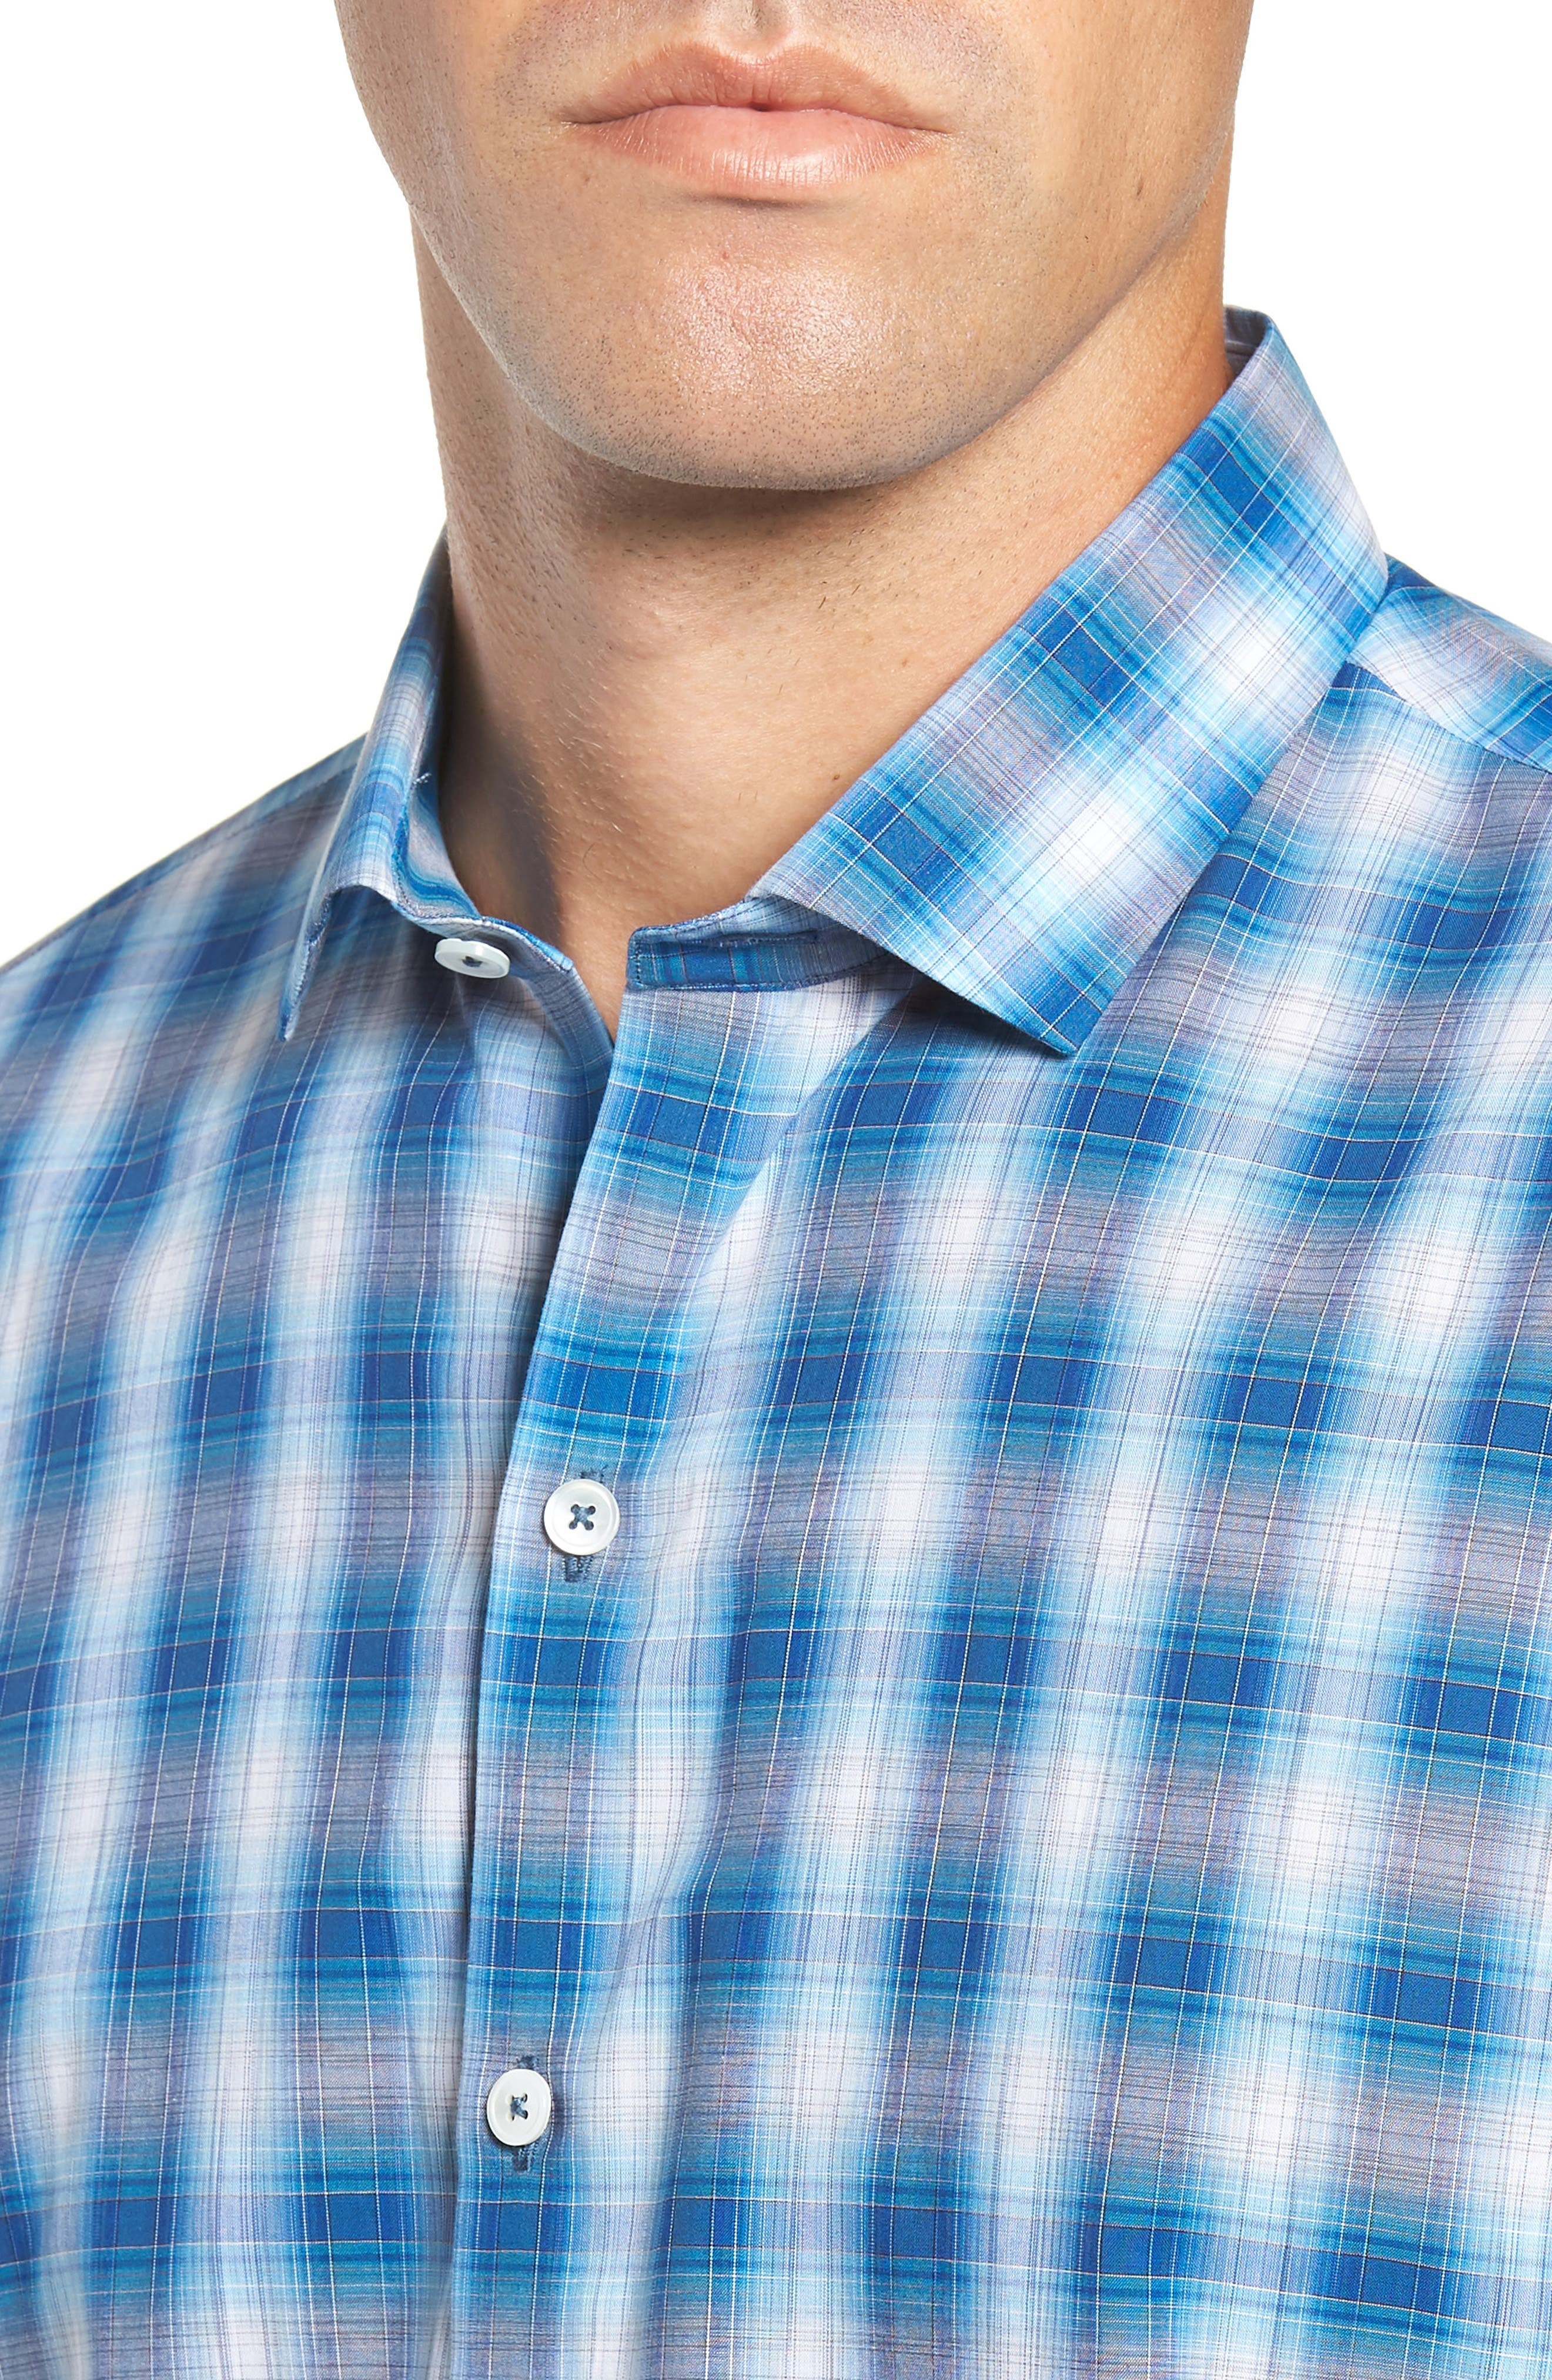 Holtsinger Plaid Sport Shirt,                             Alternate thumbnail 2, color,                             BRIGHT BLUE